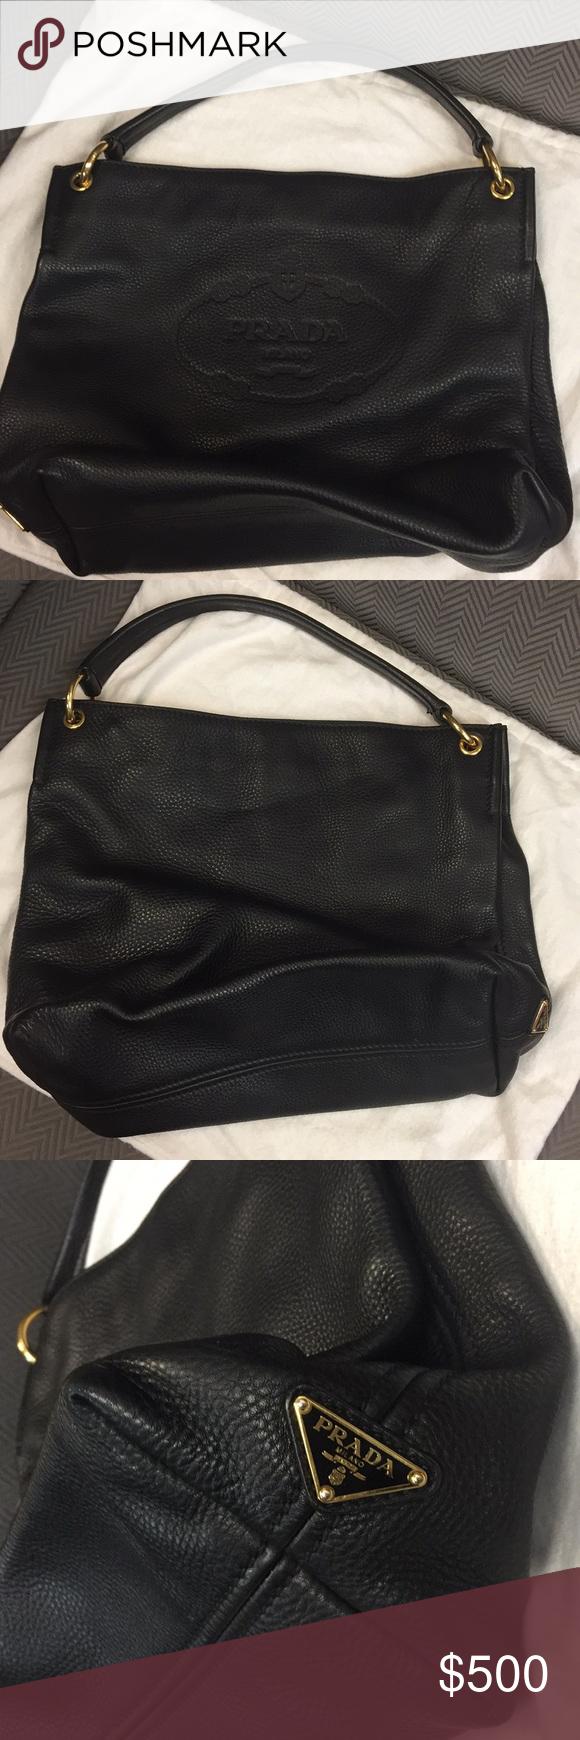 26df8fab7cc2 Prada Vitello Daino single strap hobo bag Pebbles black leather one  shoulder handbag. Normal wear